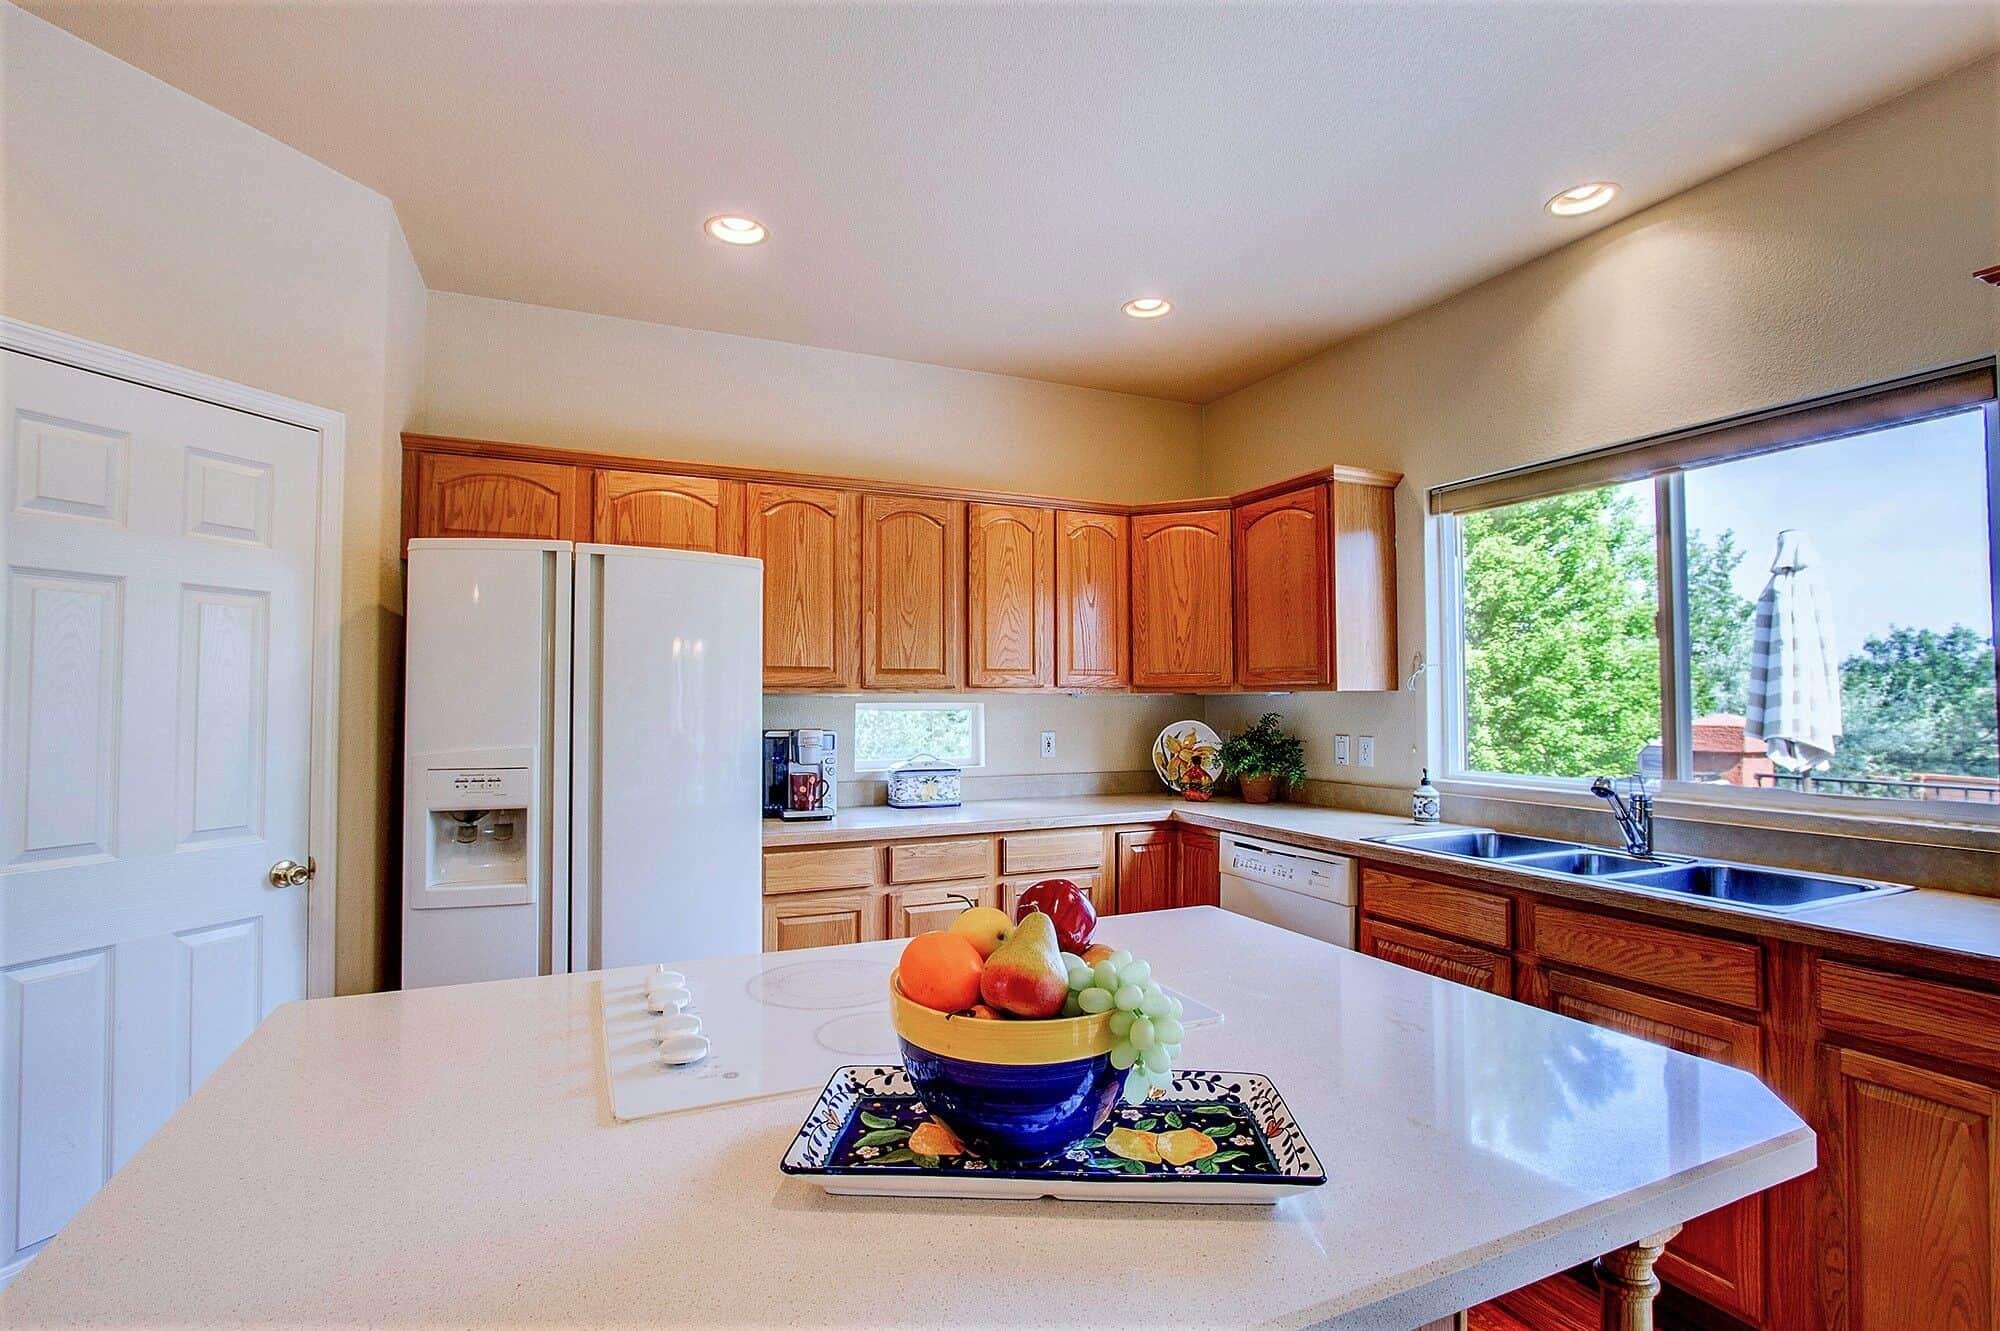 Kitchen with Quartz Counter Island